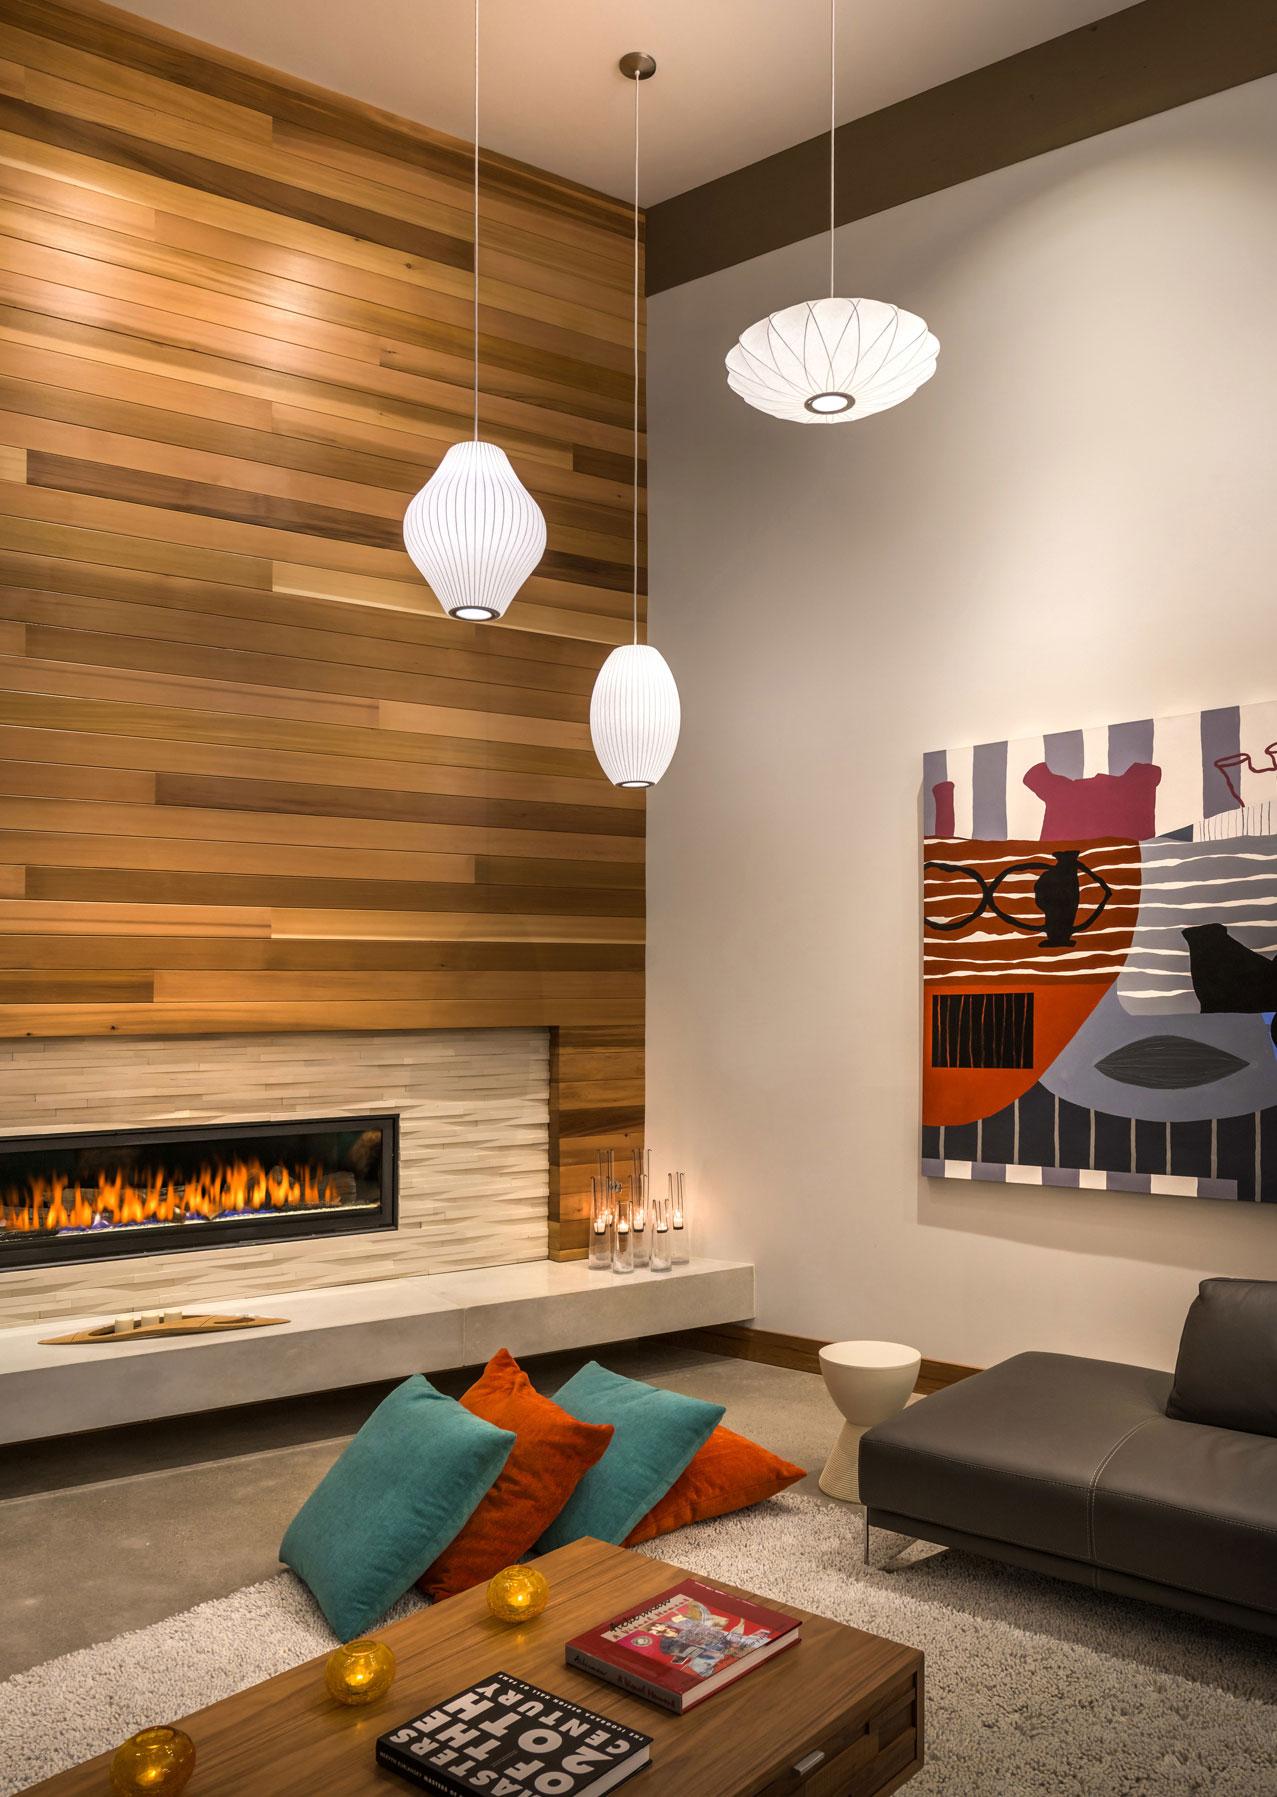 Fireplace, Lighting, Coffee Table